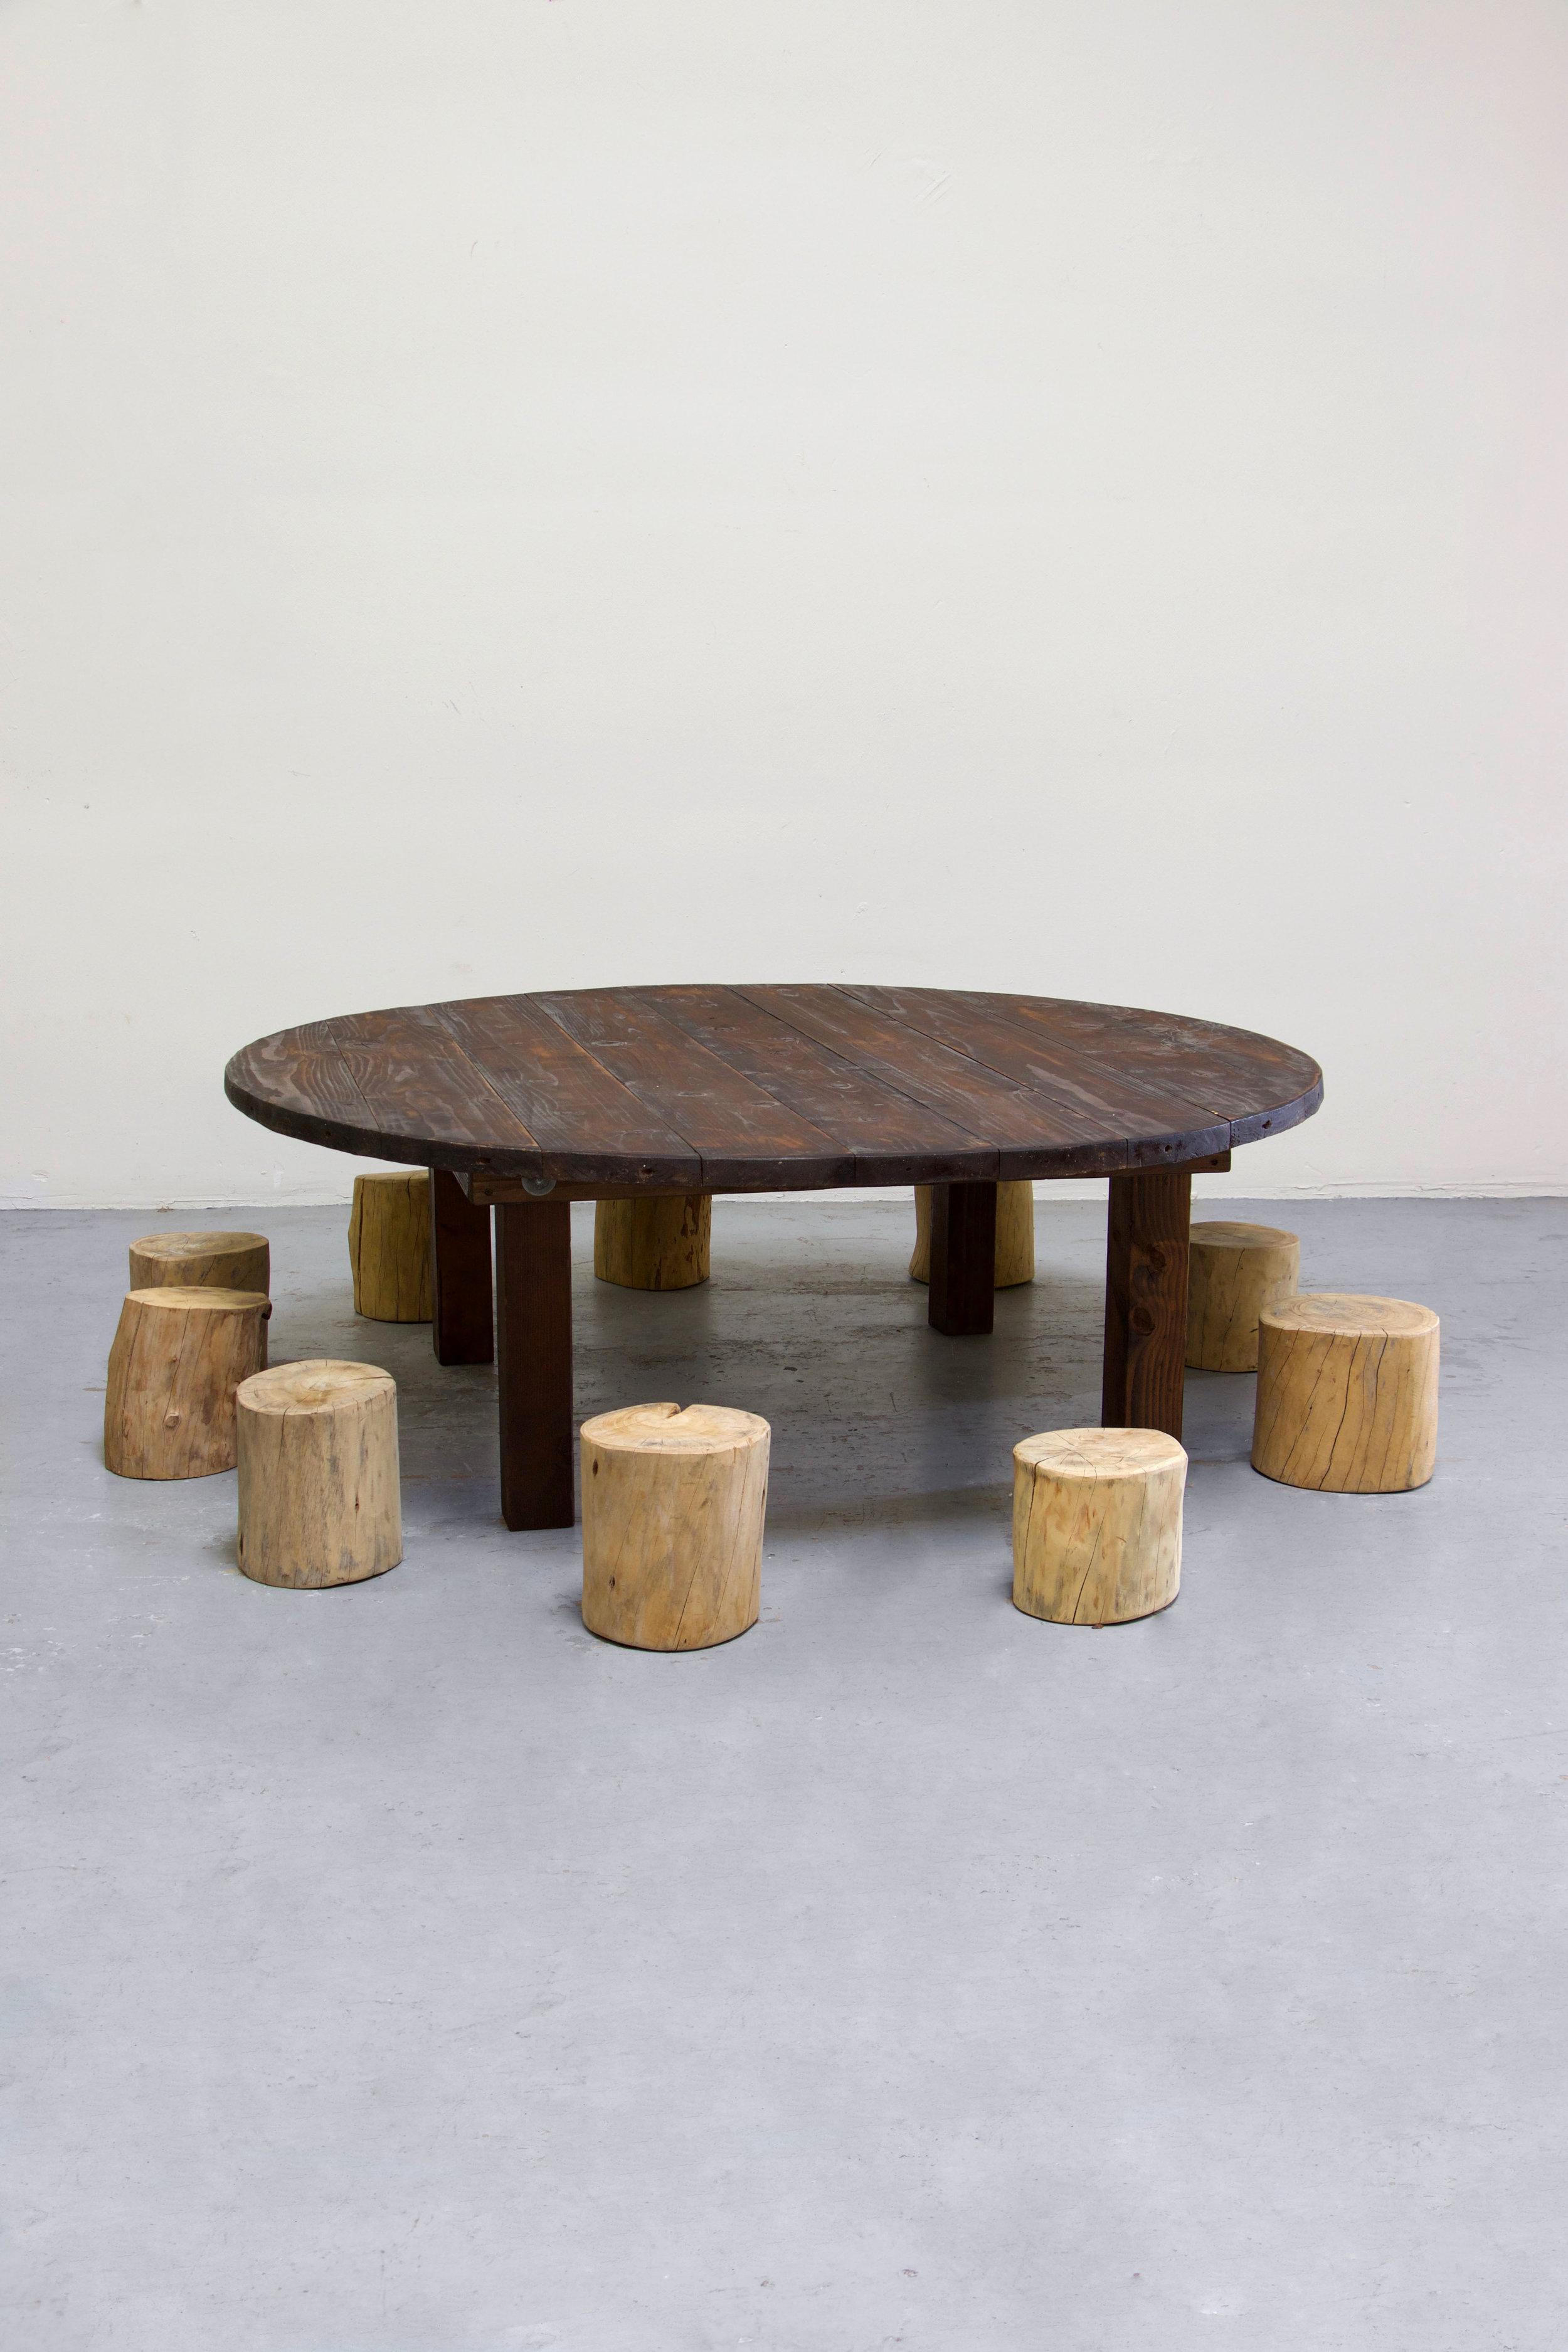 1 Kids Mahogany Round Farm Table w/ 10 Tree Stumps